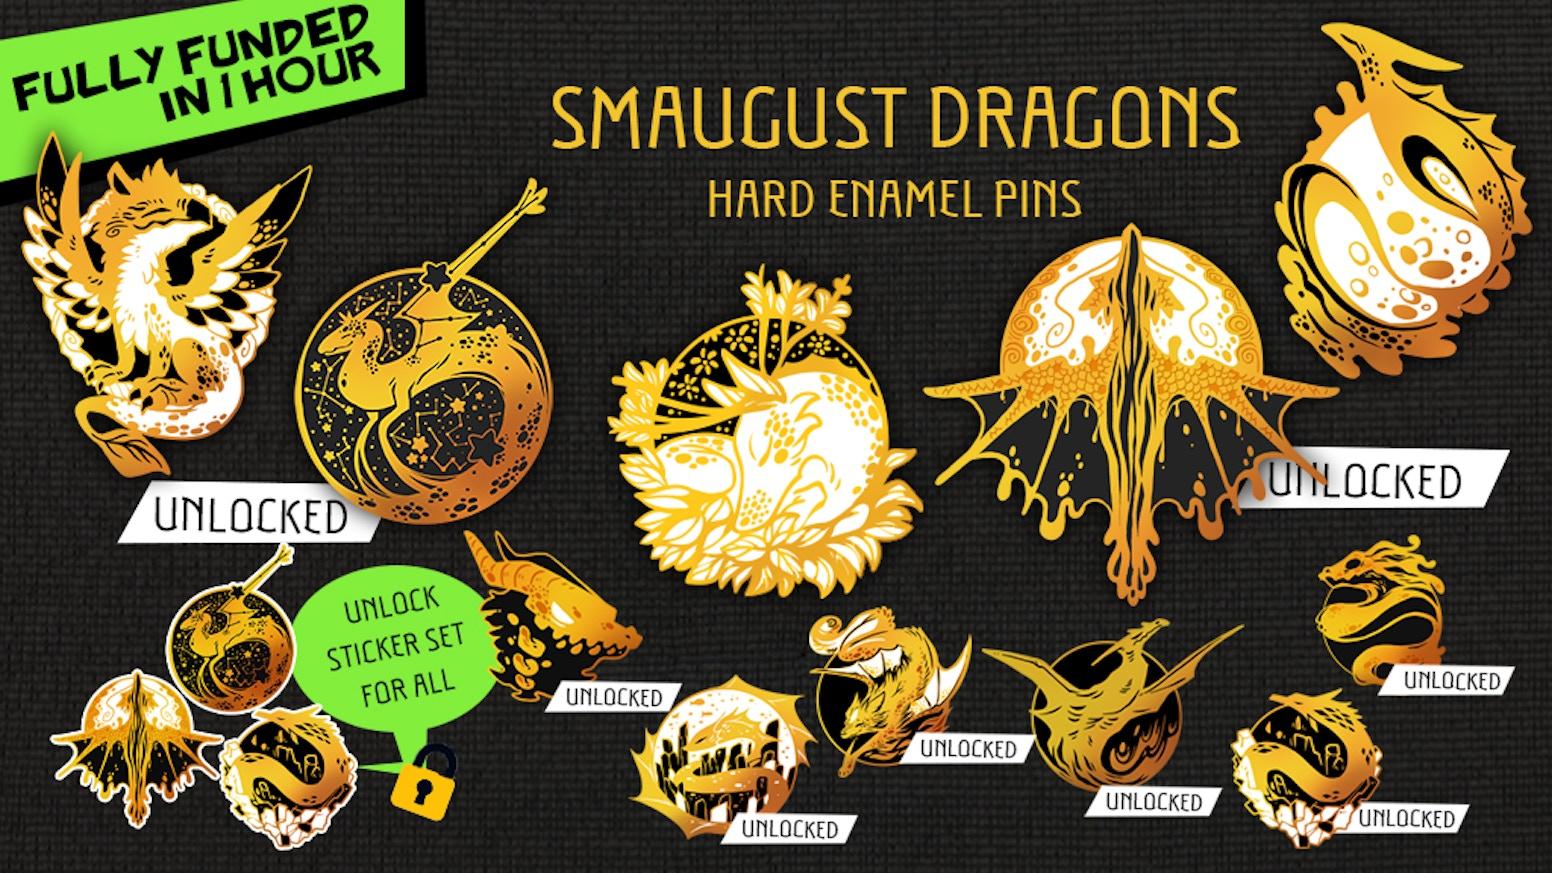 Smaugust Dragon Enamel Pin collection 2020